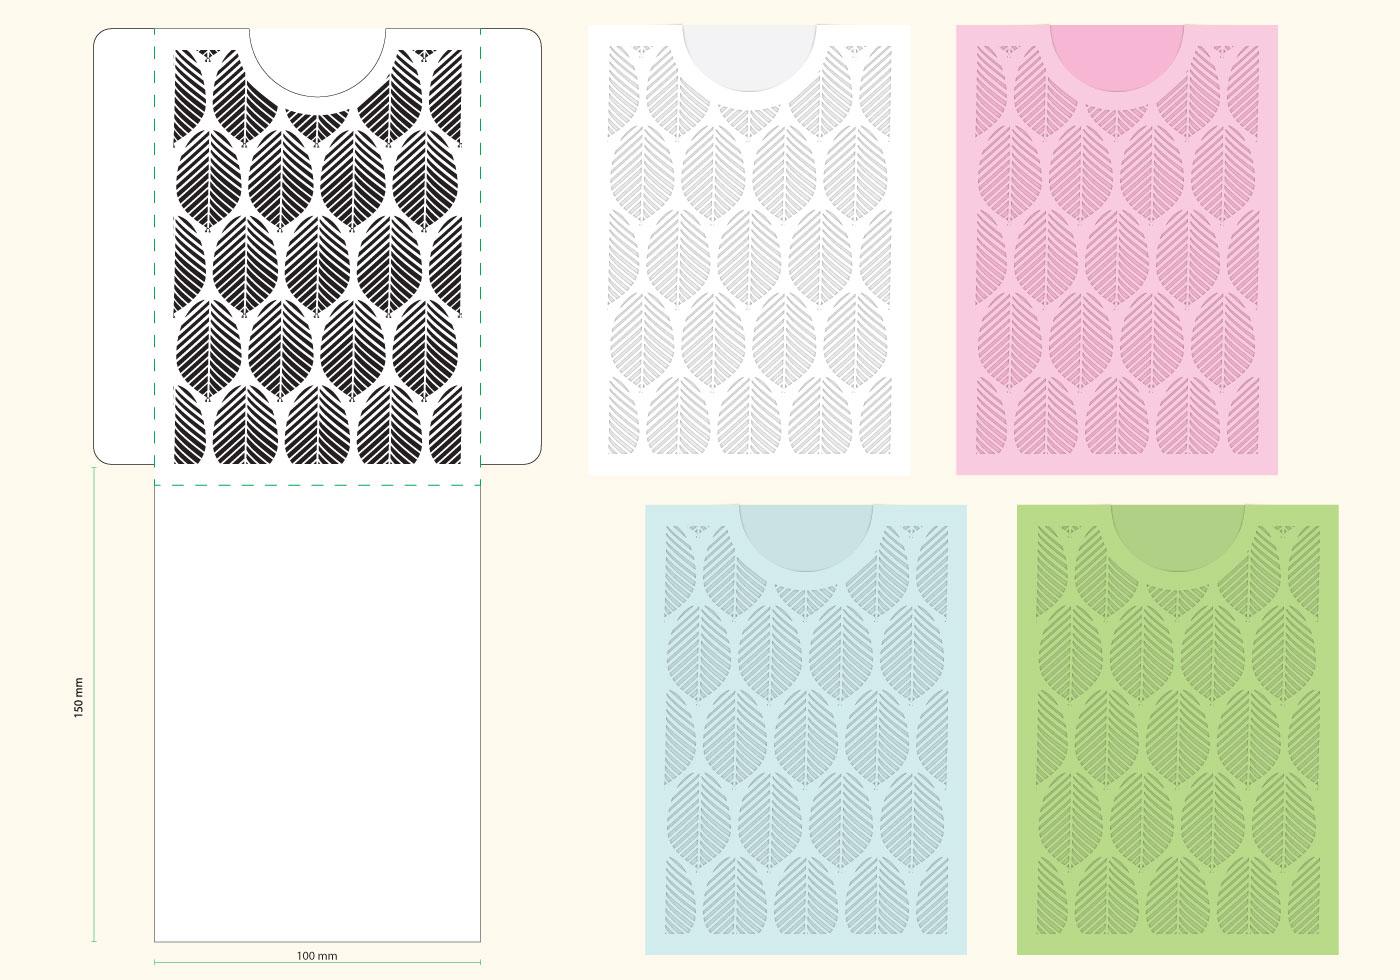 Laser Cut Organic Envelope Template Download Free Vector Art Stock Graphics Amp Images